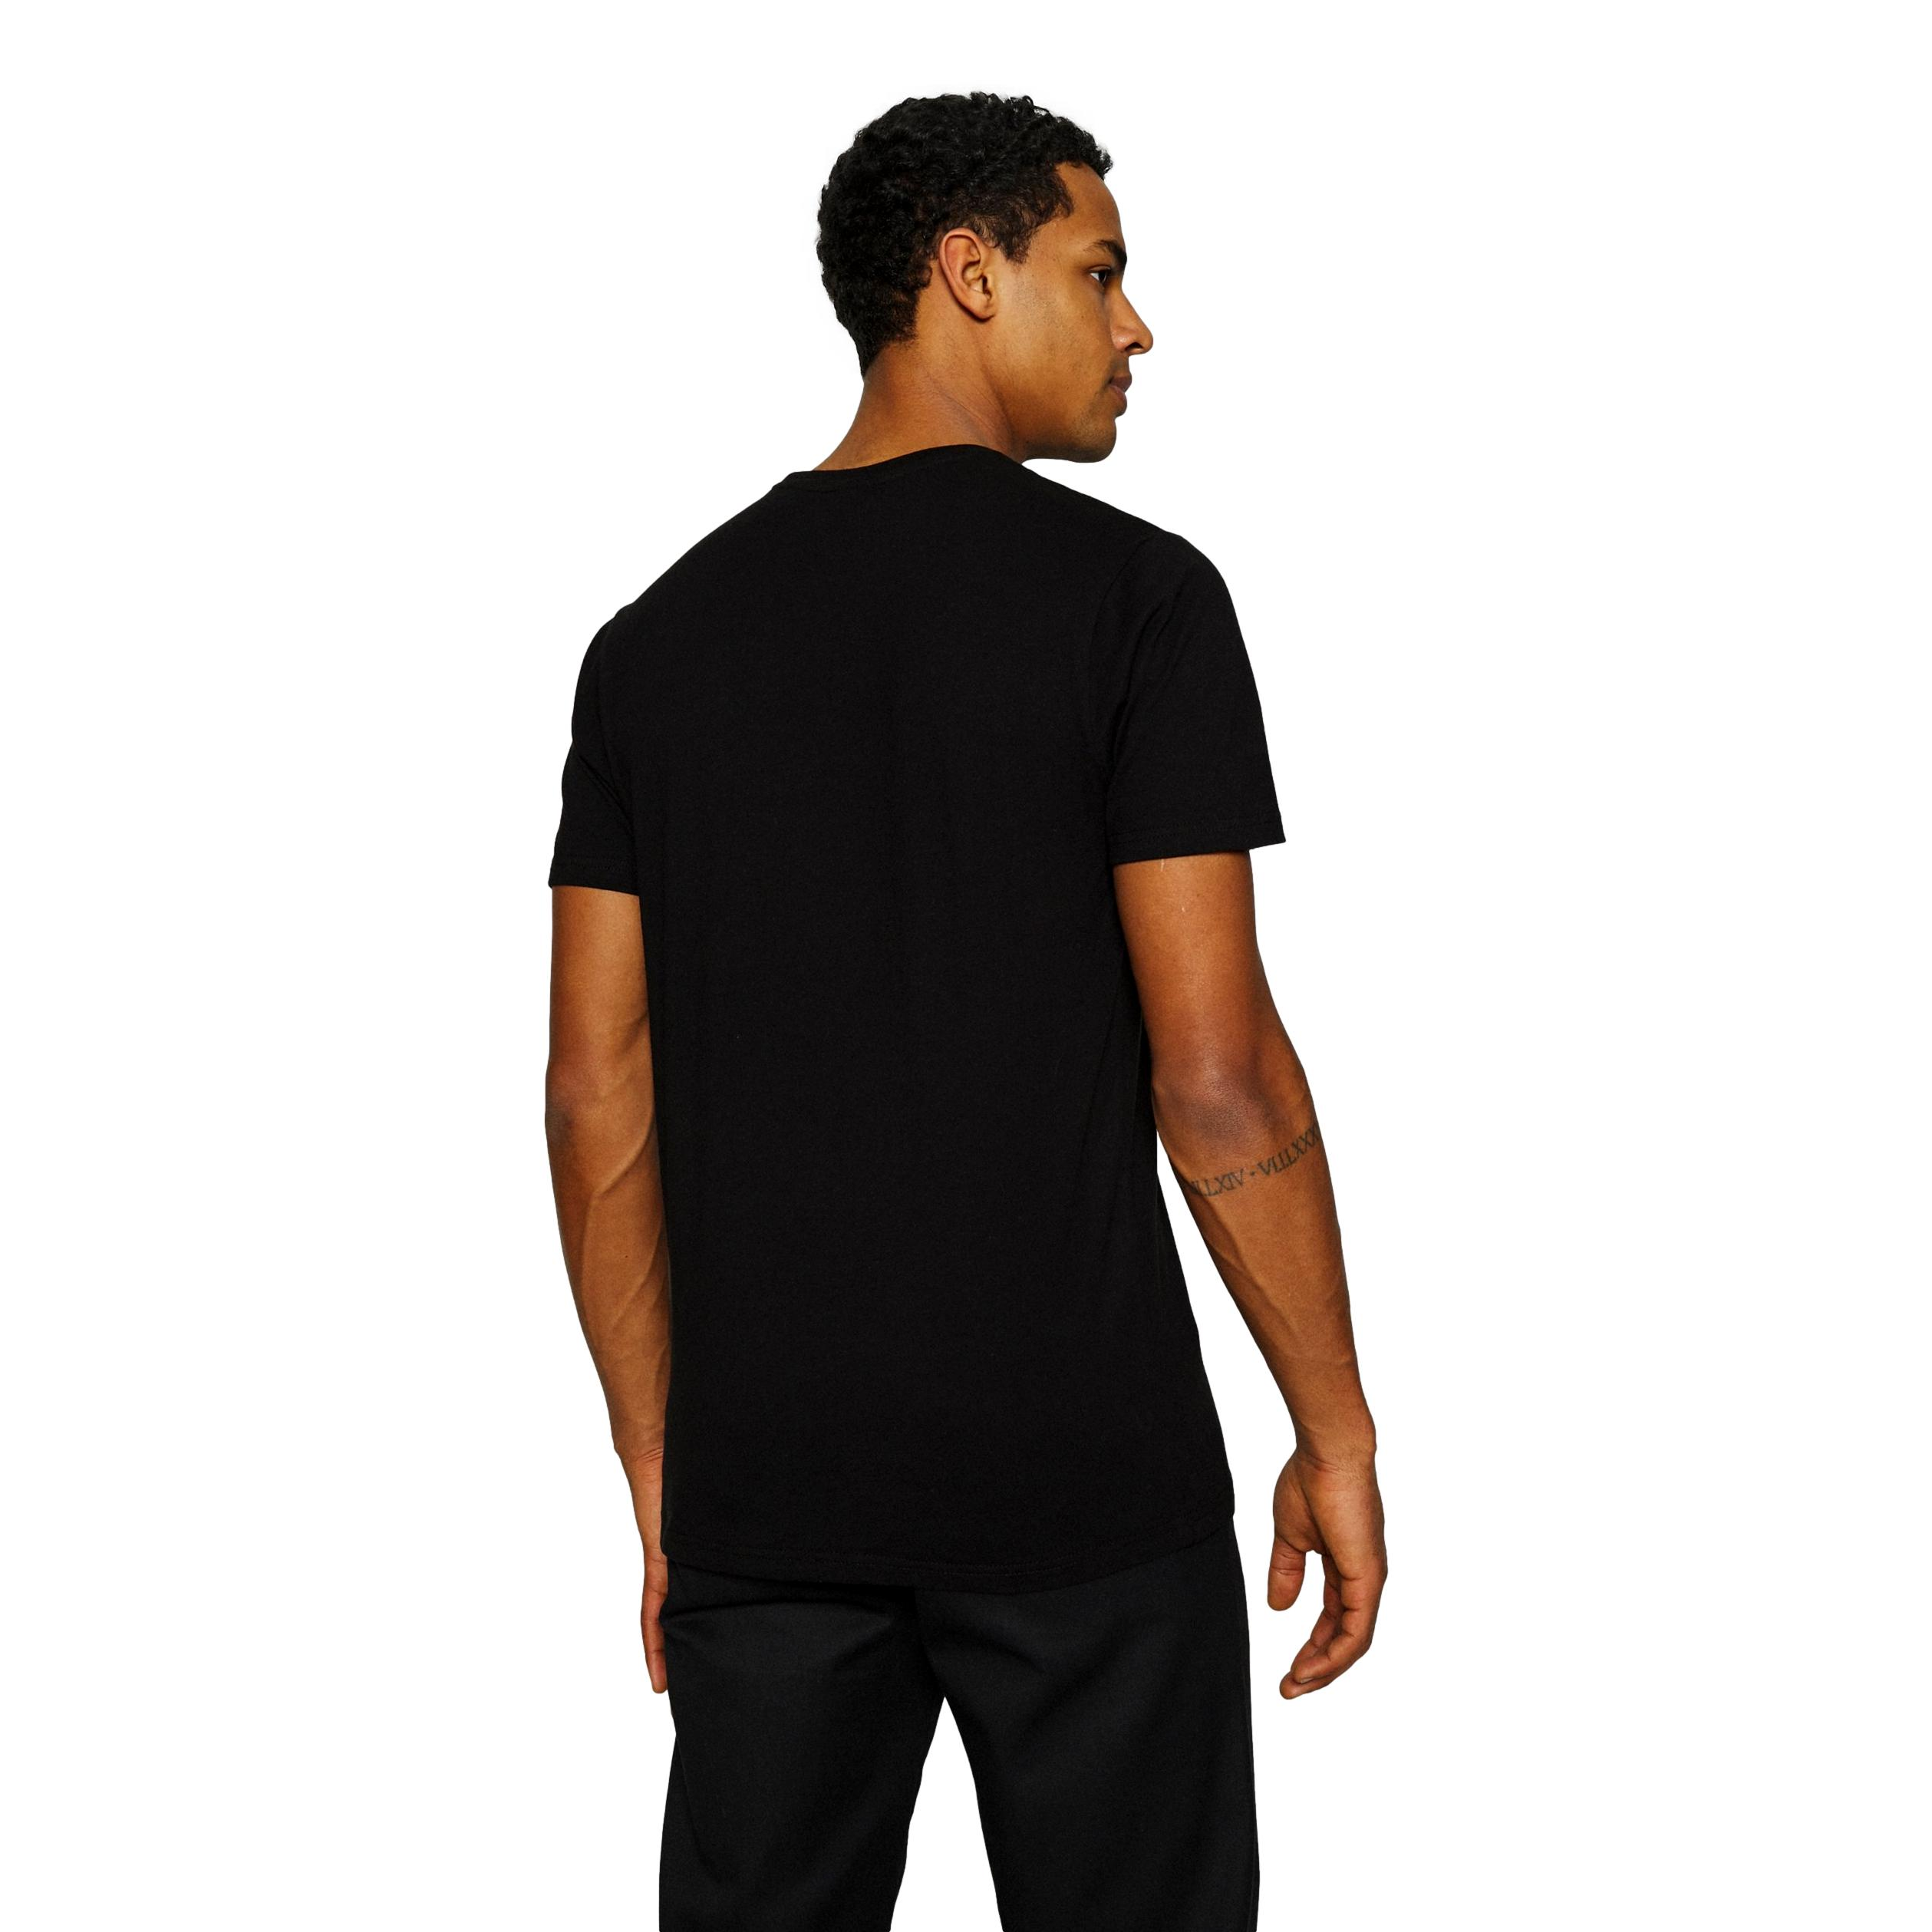 SMALL LOGO PRADO - T-shirt ELLESSE |  | EHM903CO050